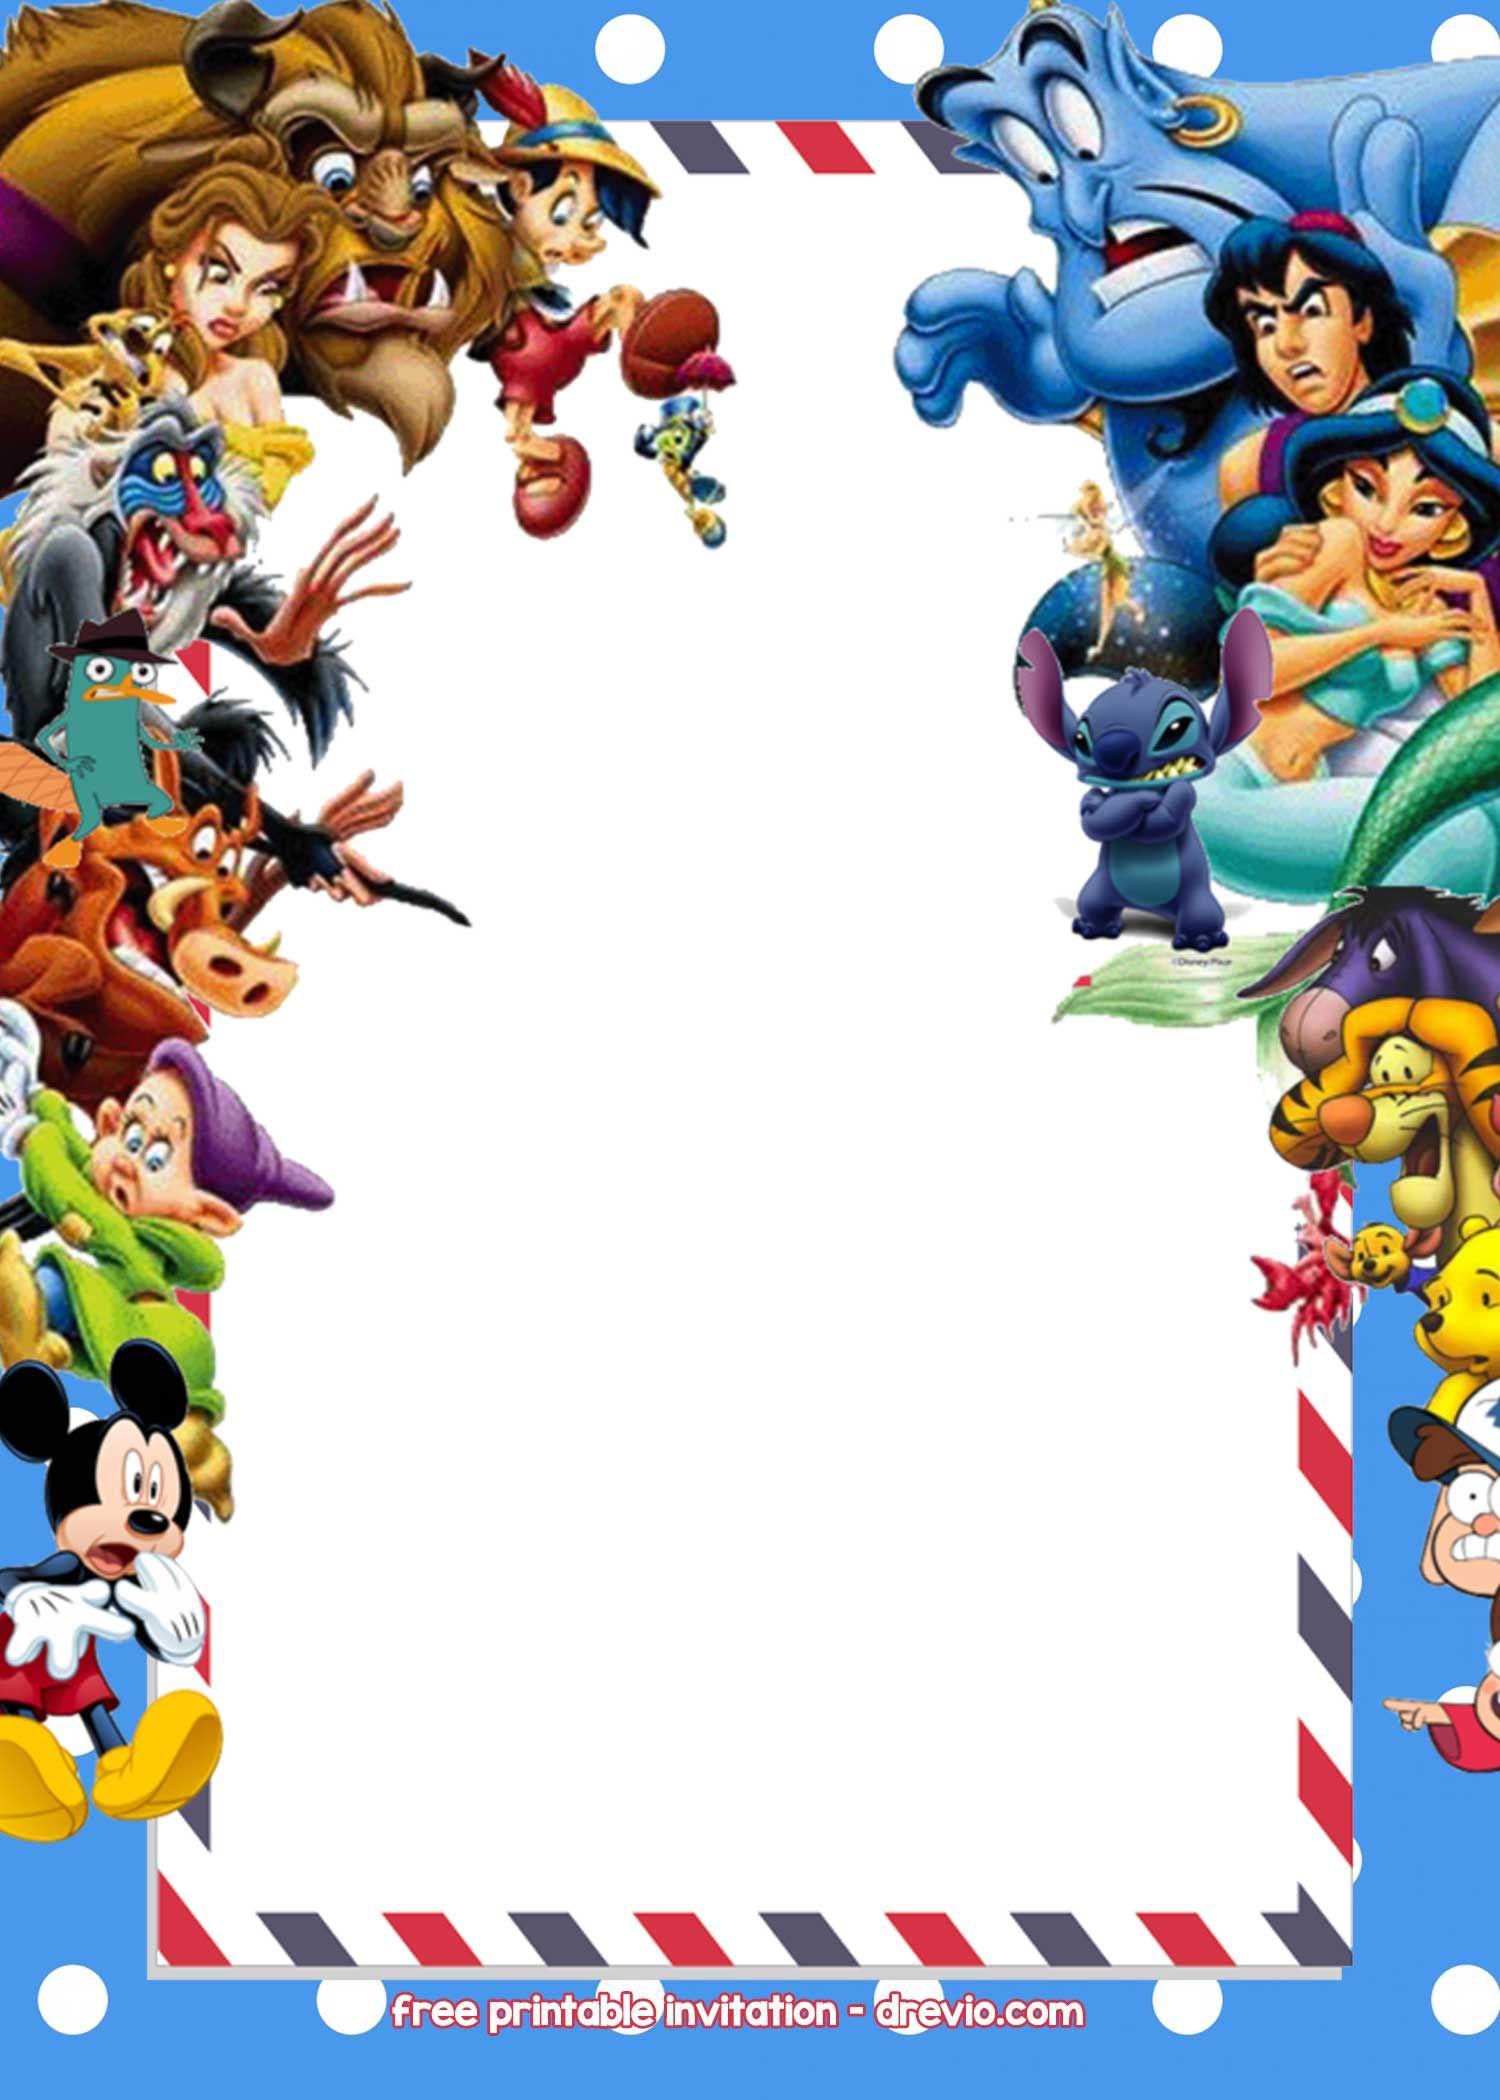 Free Disney Invitations Templates | Free Printable Birthday - Free Printable Disney Invitations